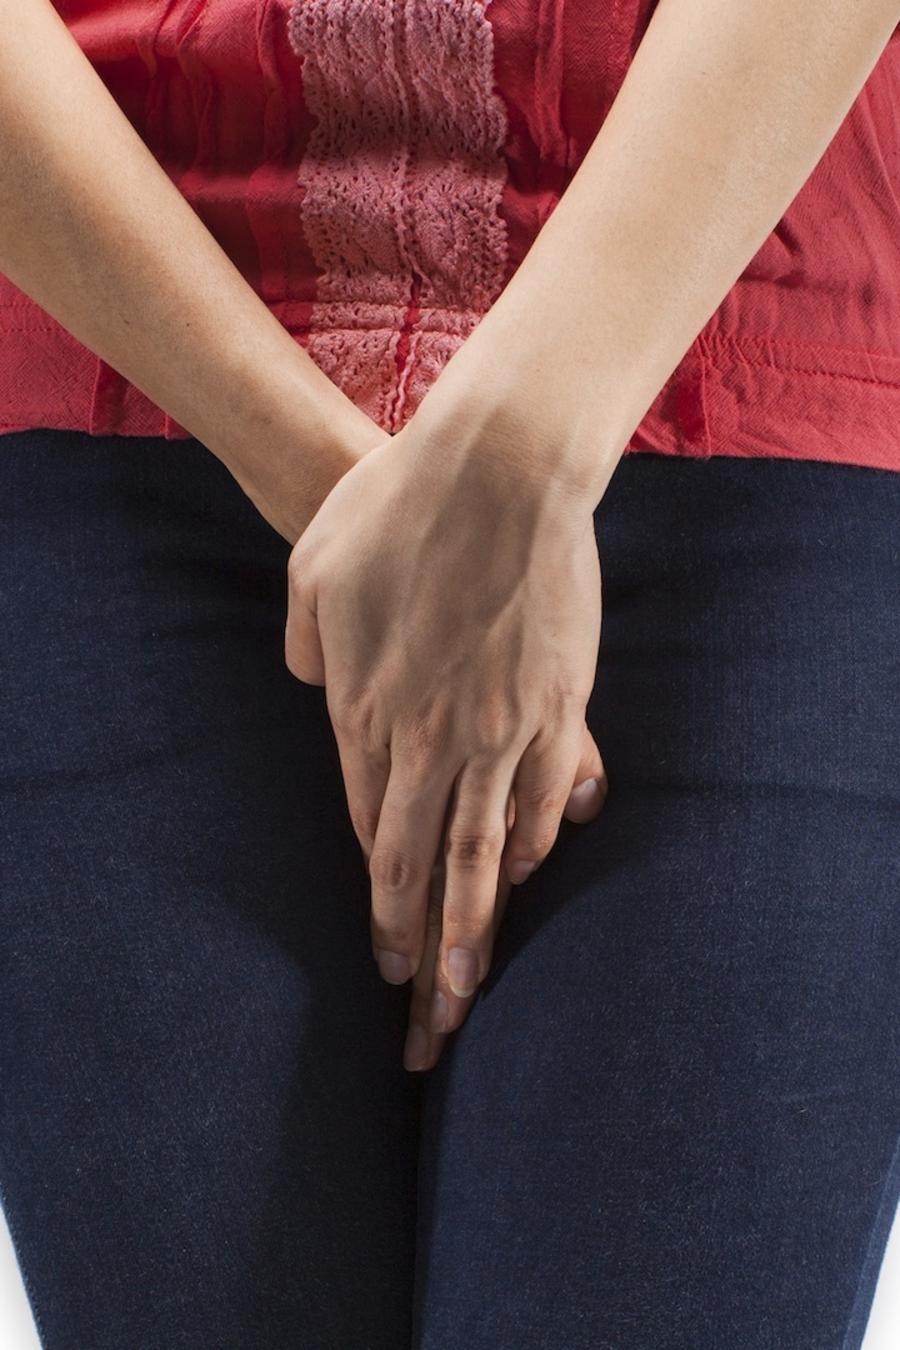 Mujer tapándose la zona genital